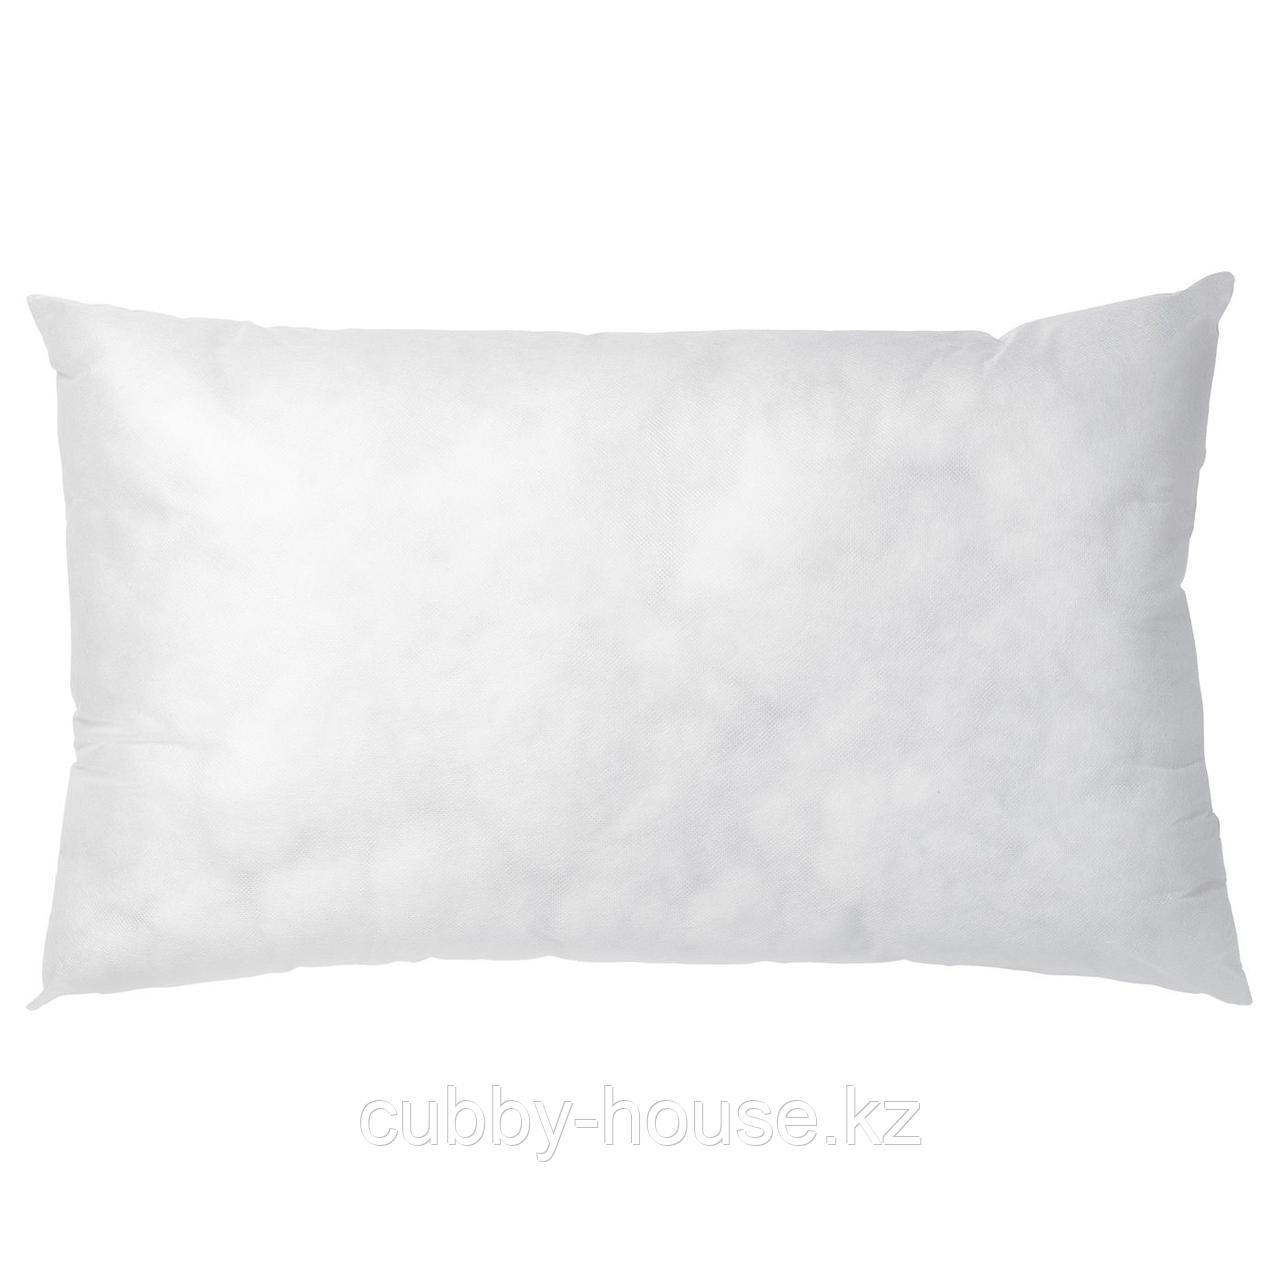 ИННЕР Подушка, белый, 40x65 см